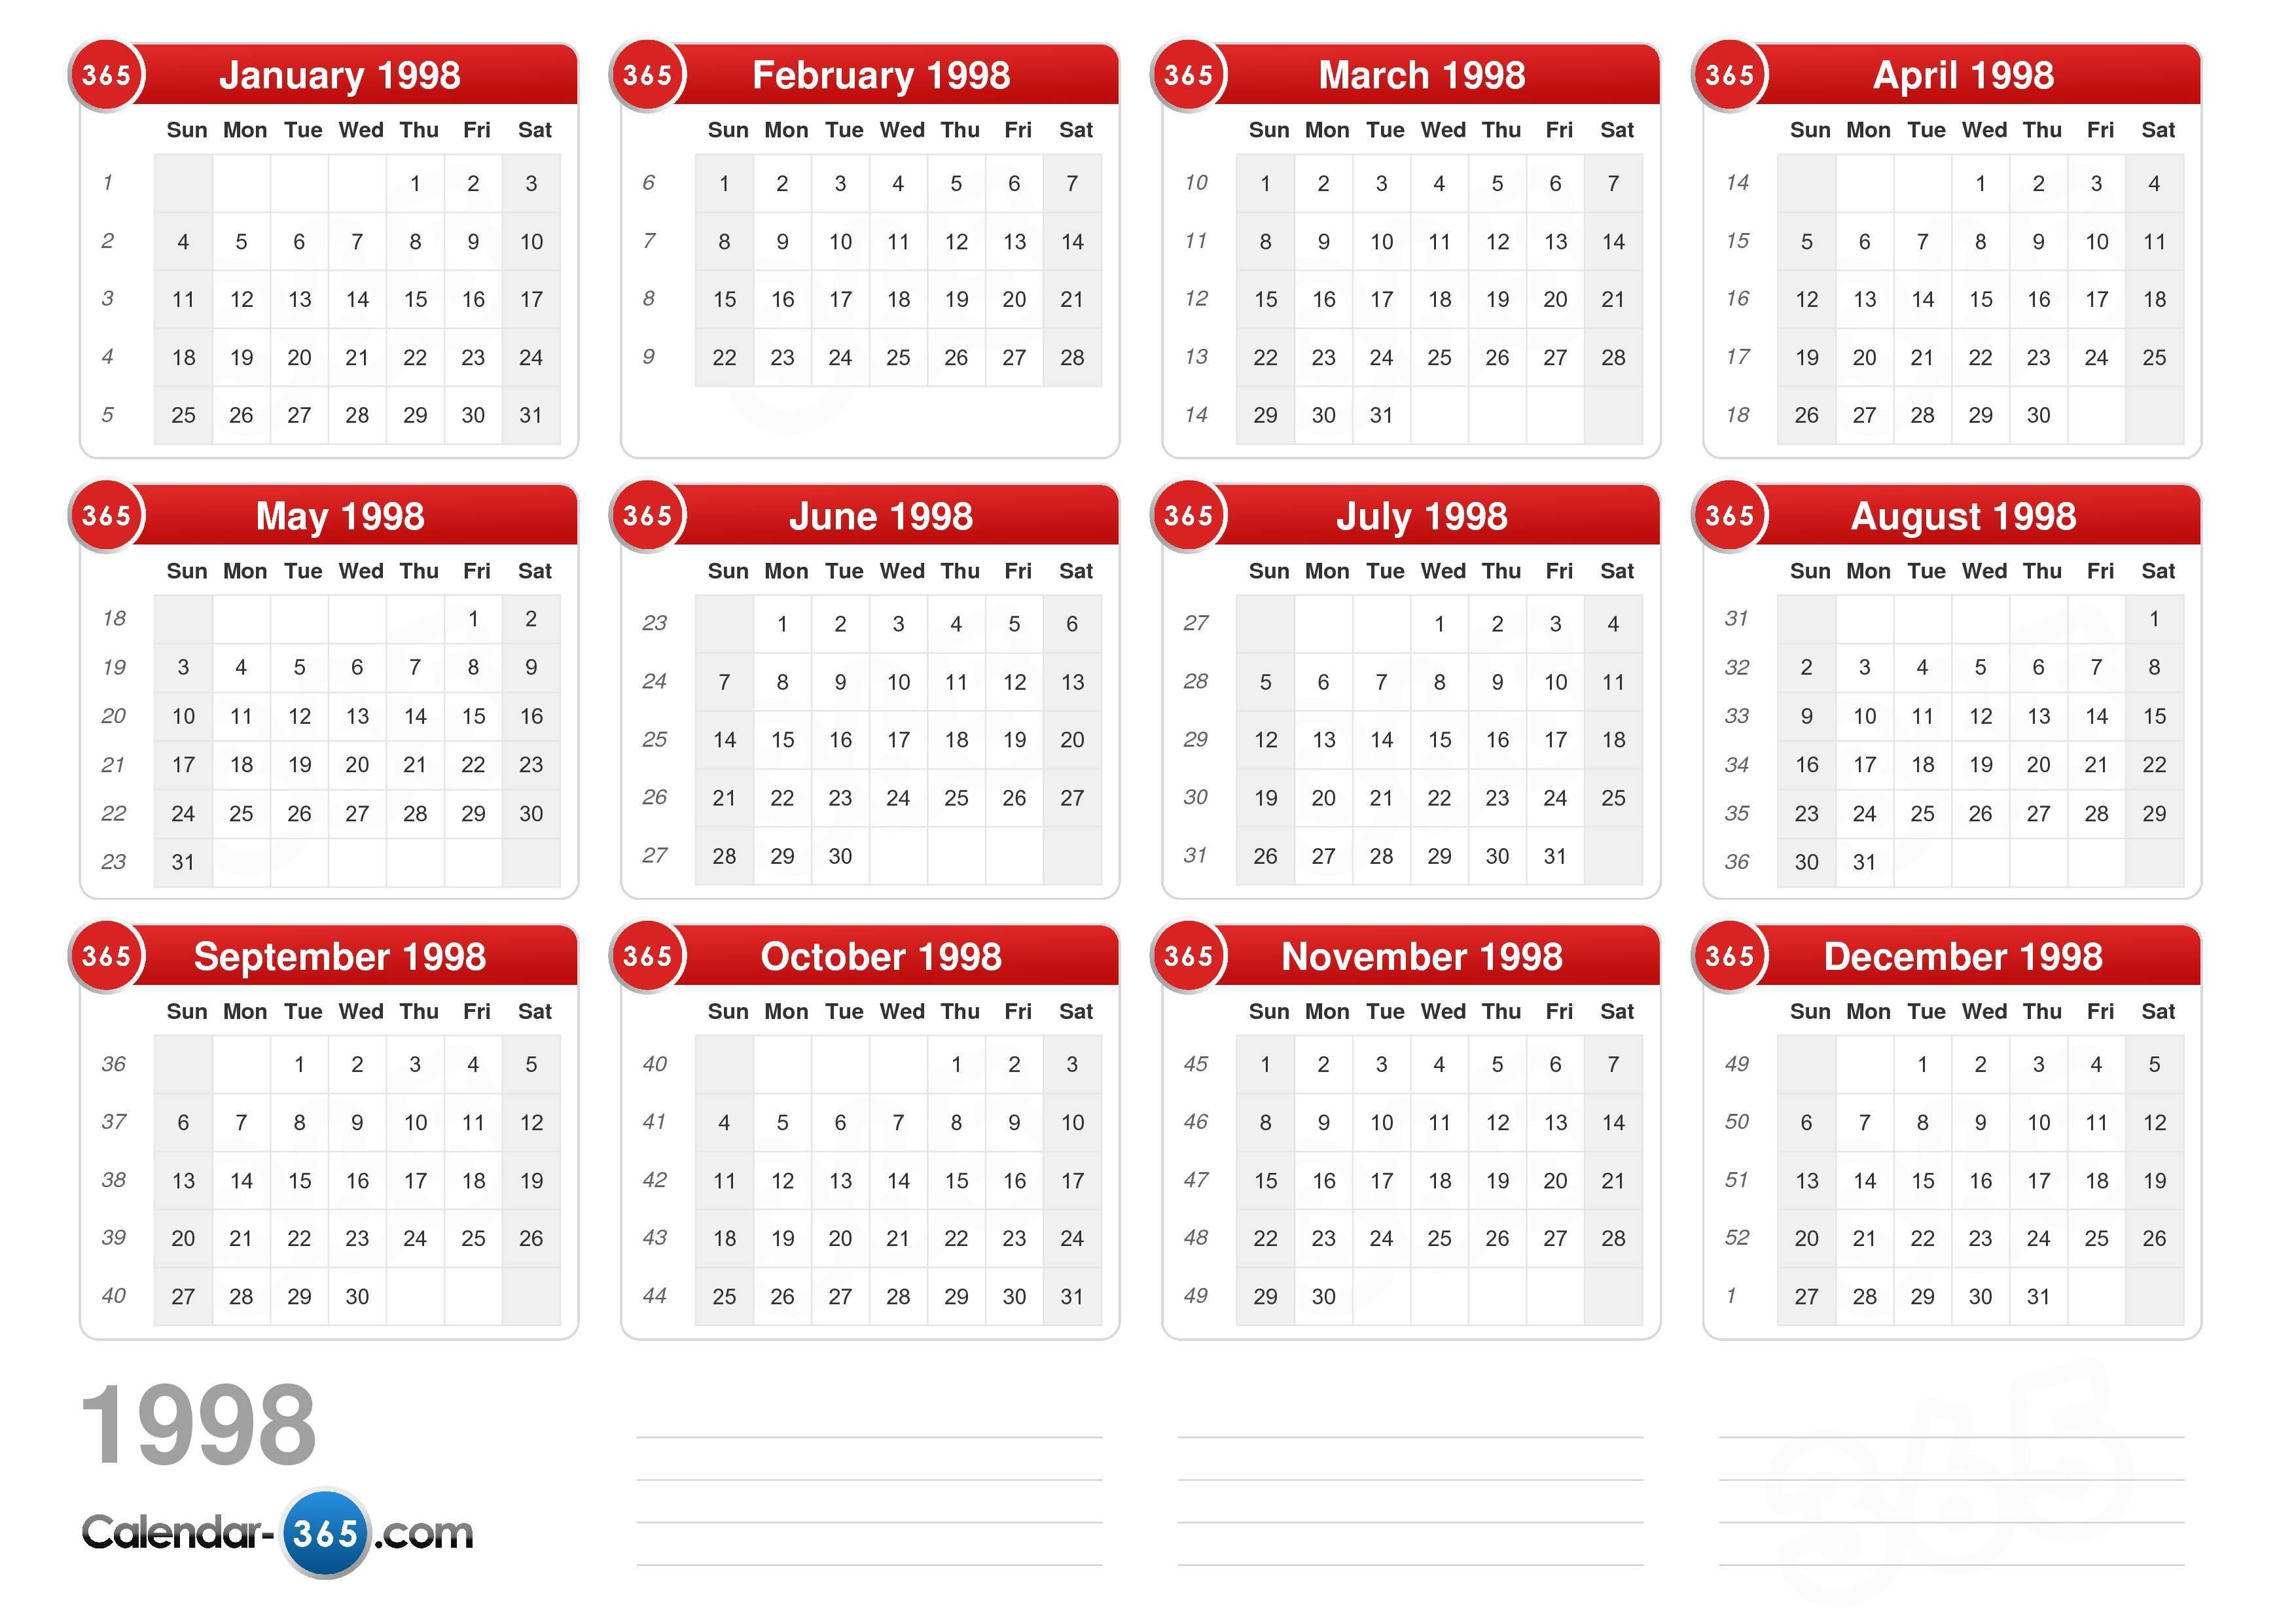 1998 Calendar